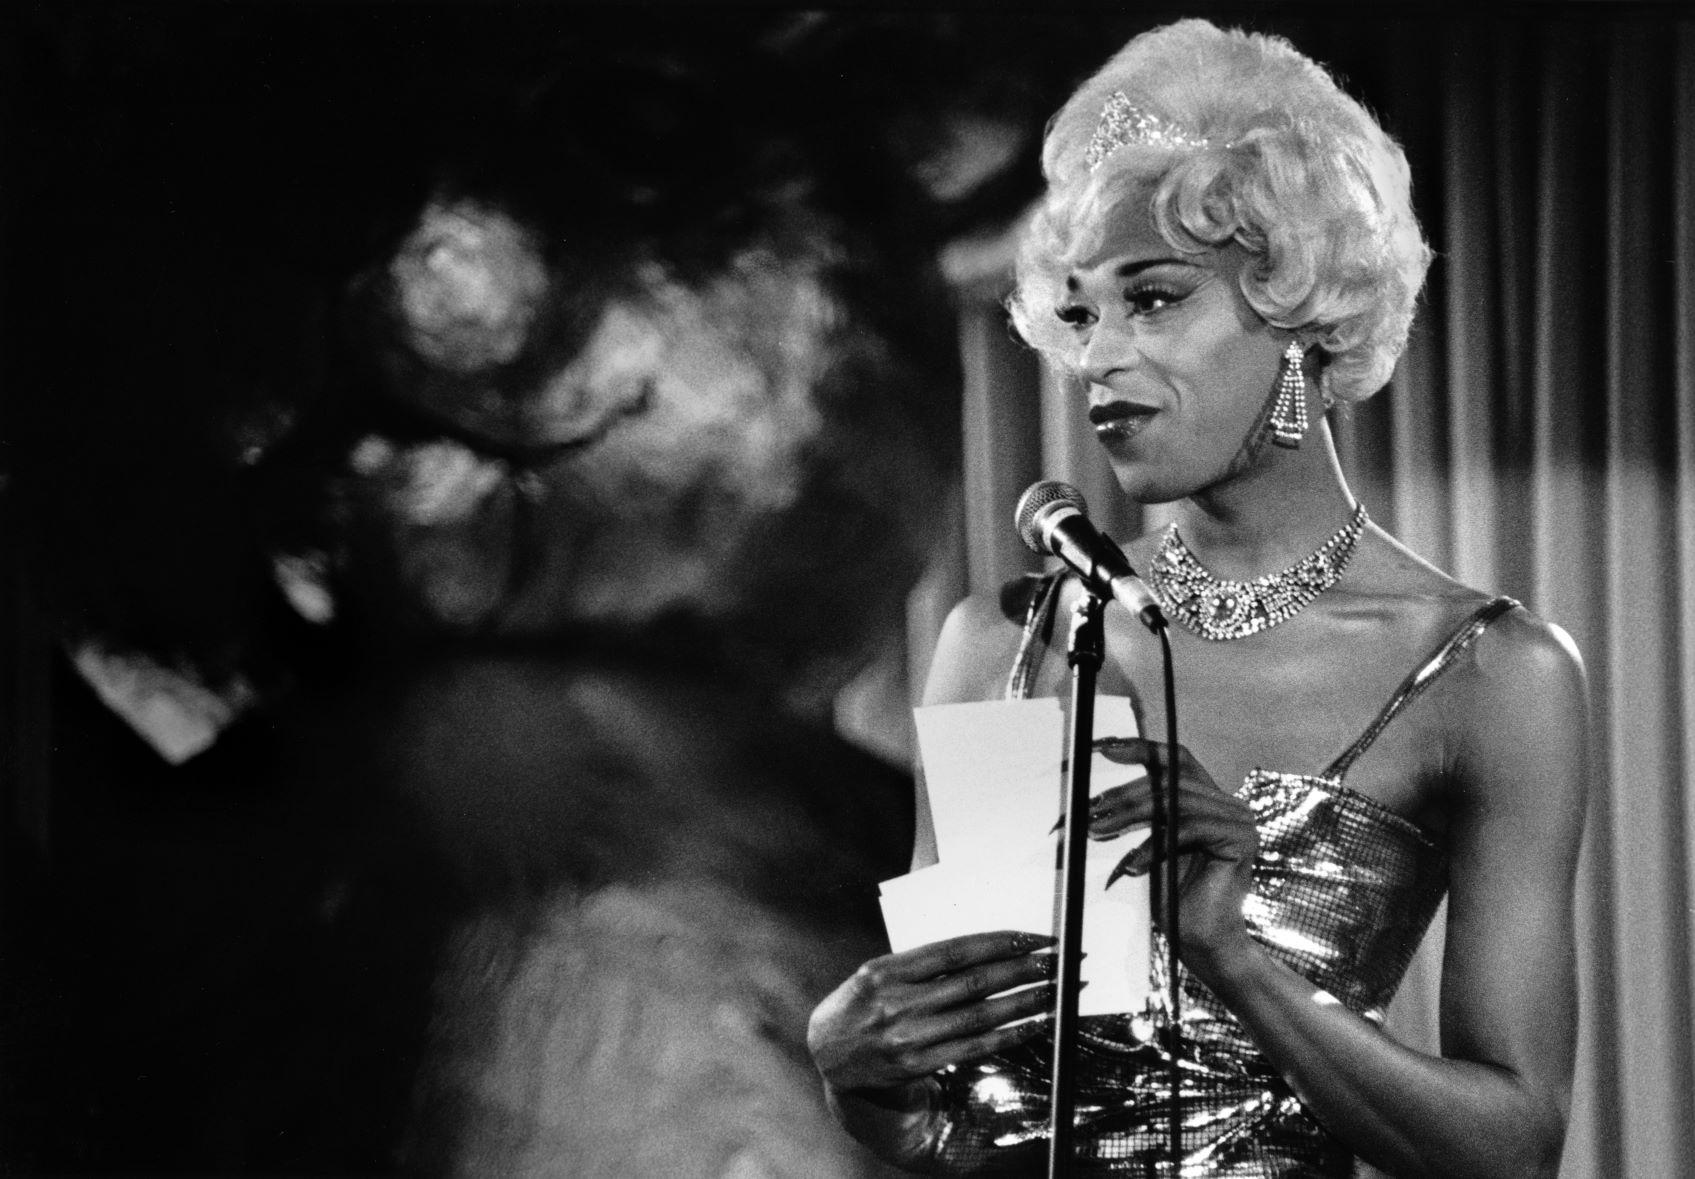 Nihad Nino Pušija: Queen Kenny at theTeddy Awards SO36, 1996